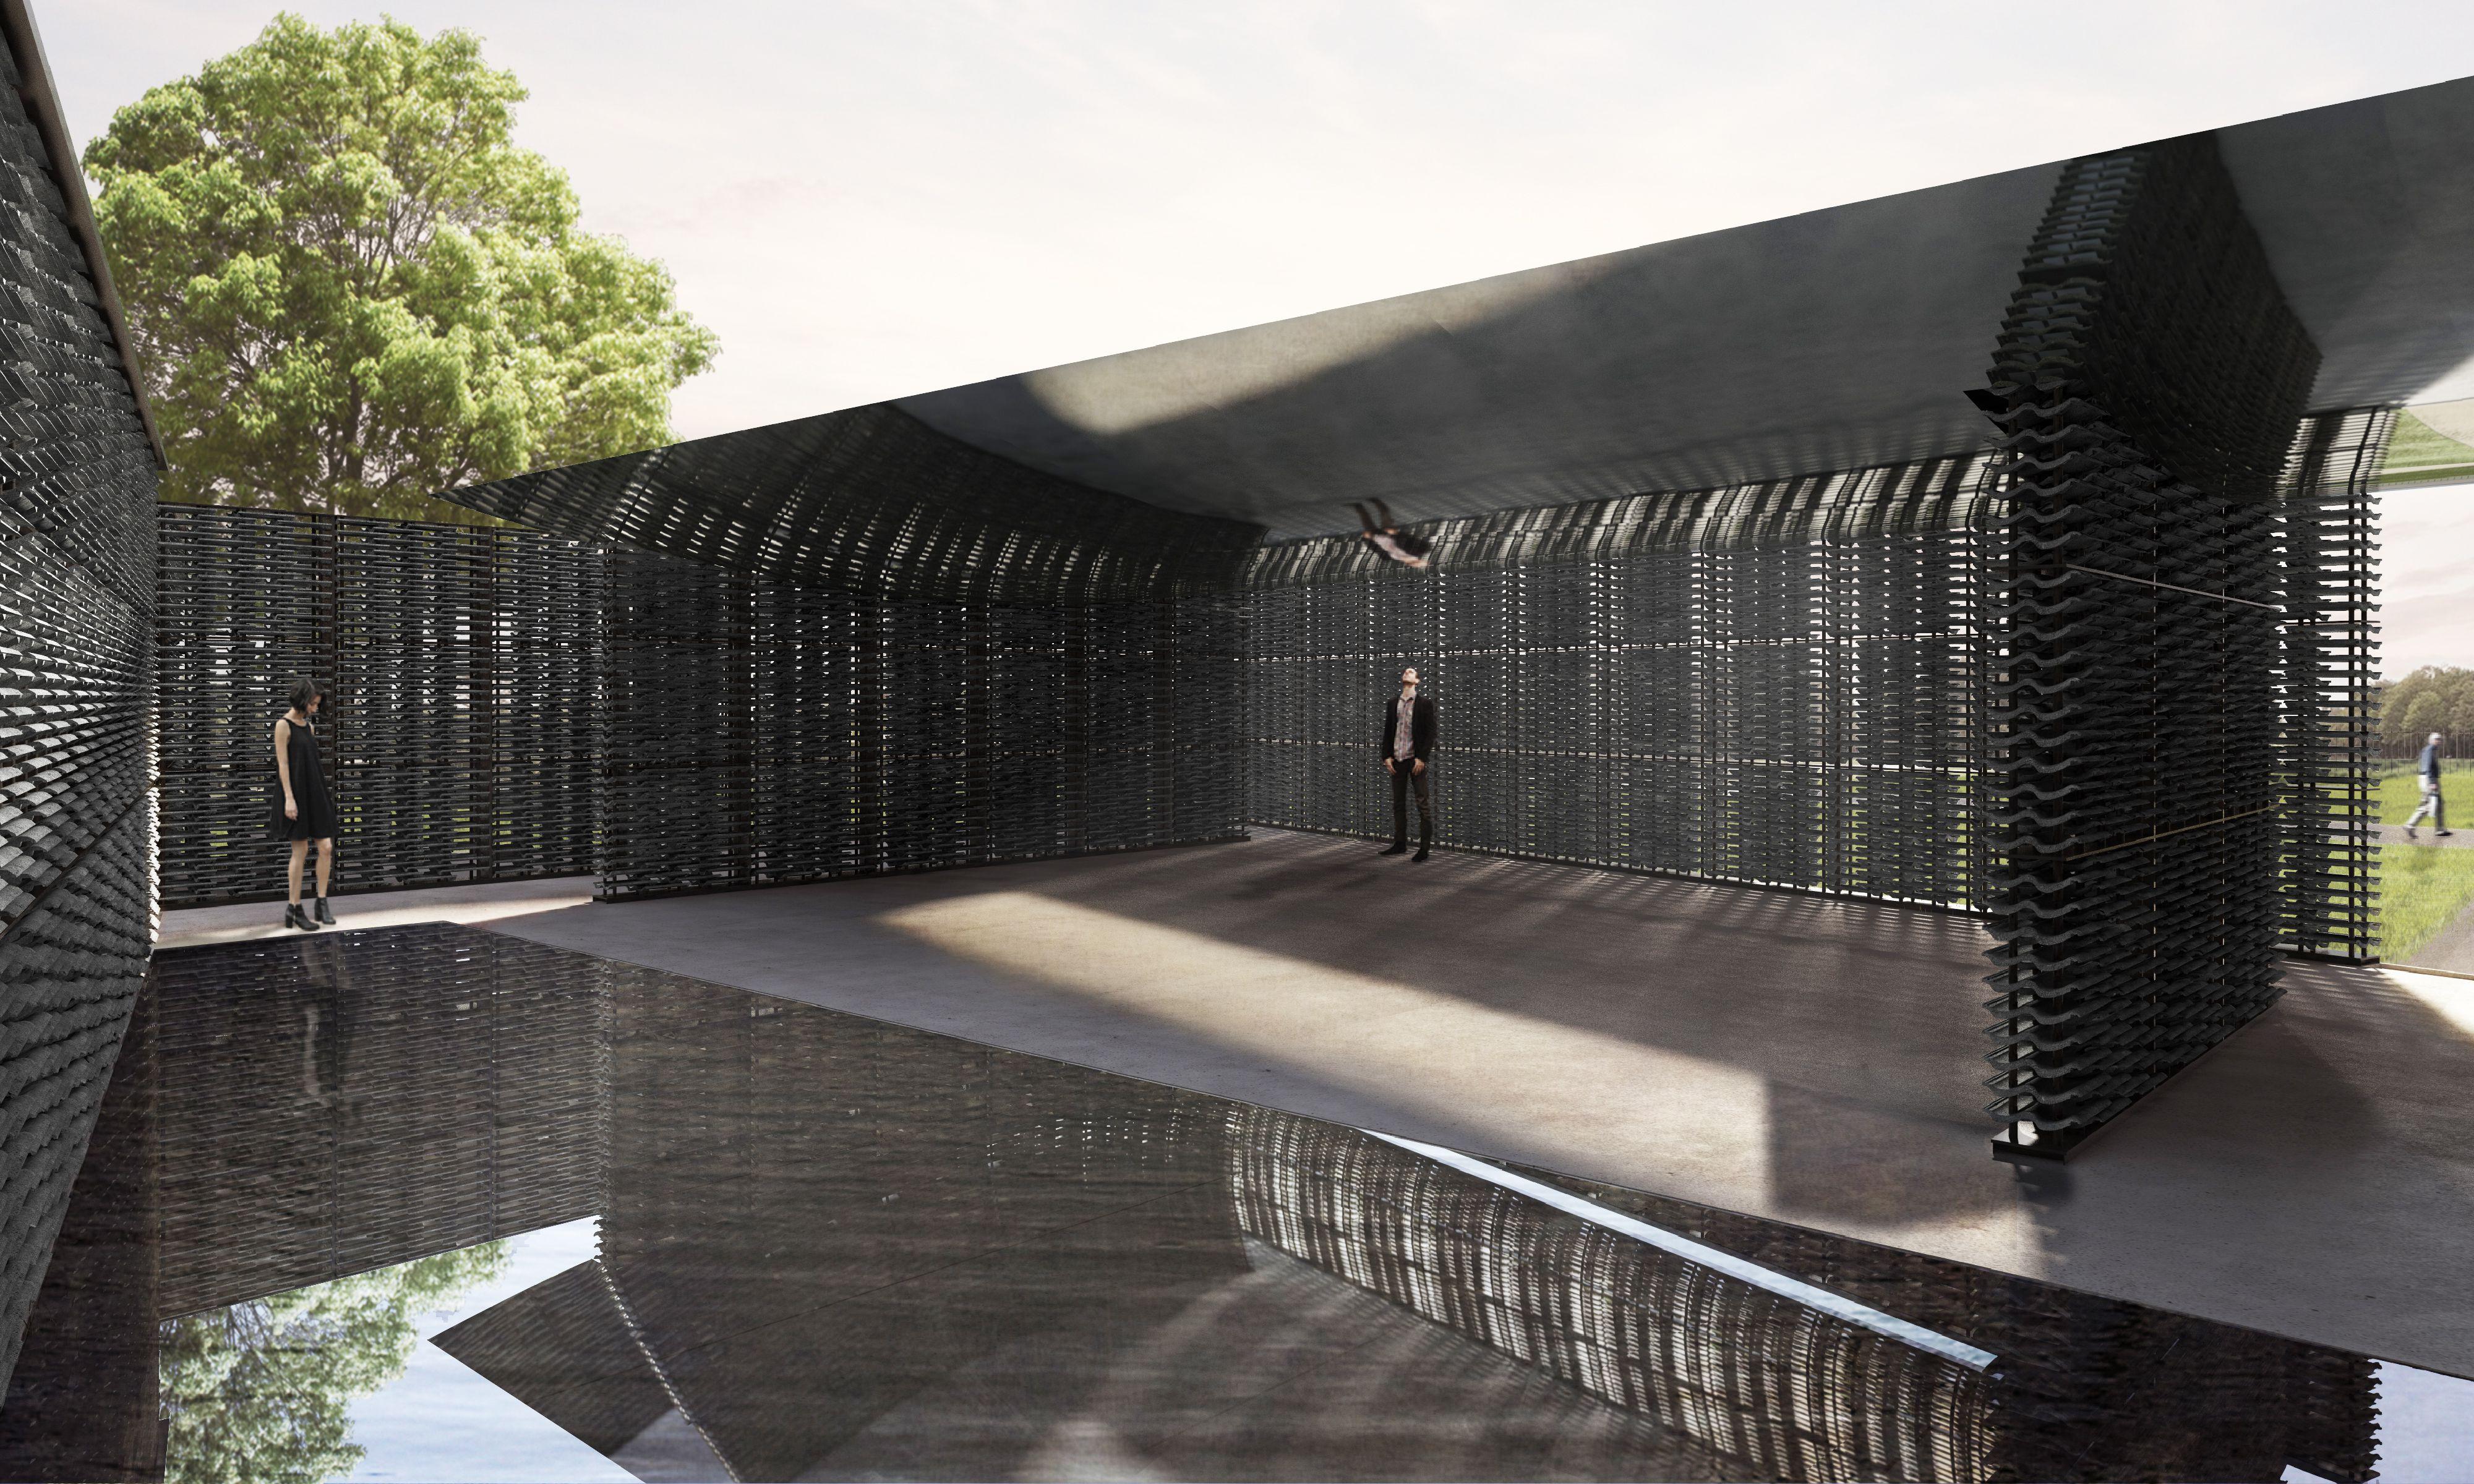 Rendering of Serpentine Pavilion 2018 Designed by Frida Escobedo